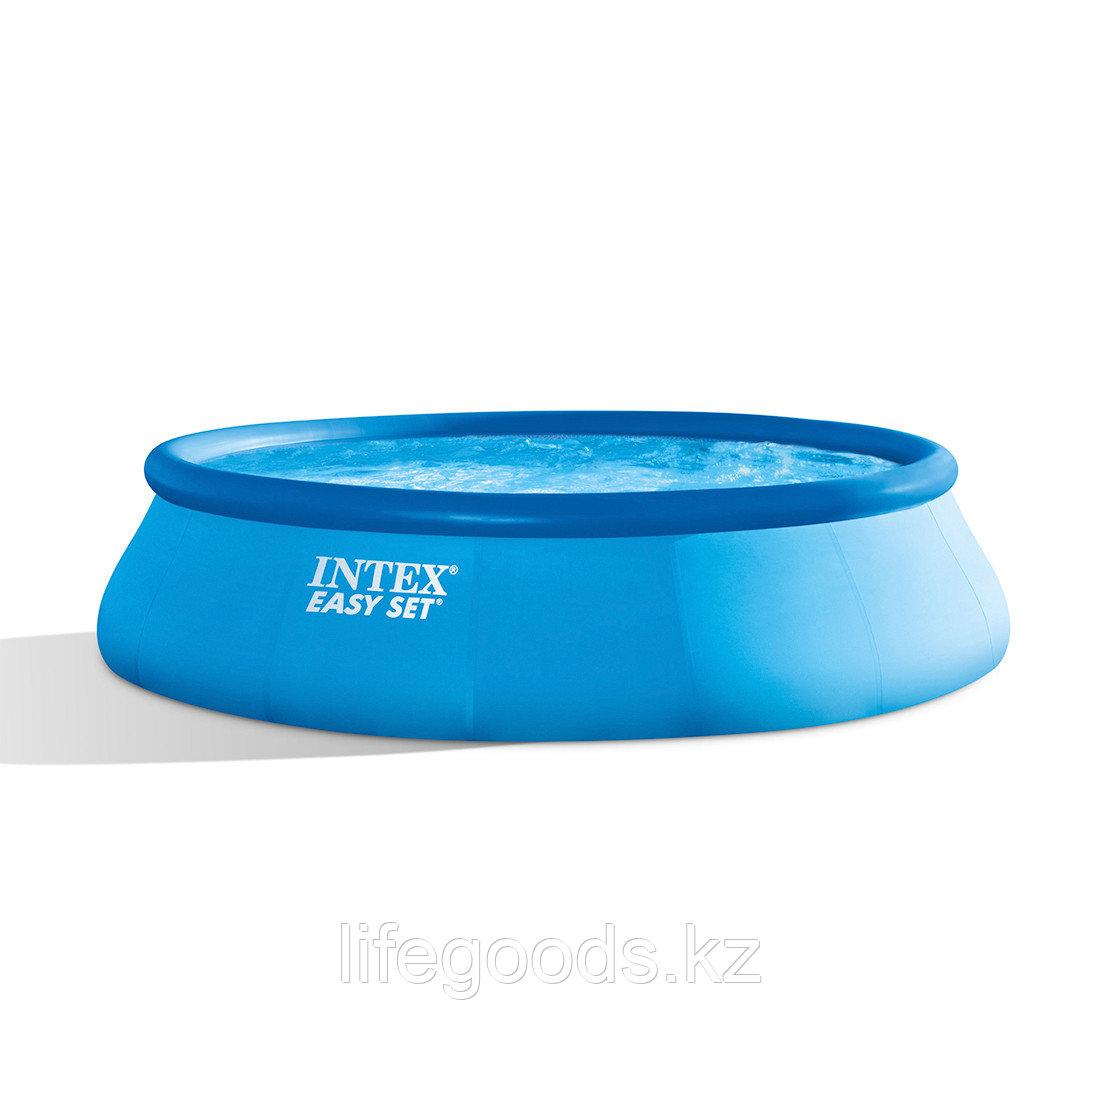 Надувной бассейн Easy Set 457х107 см Intex 26166NP